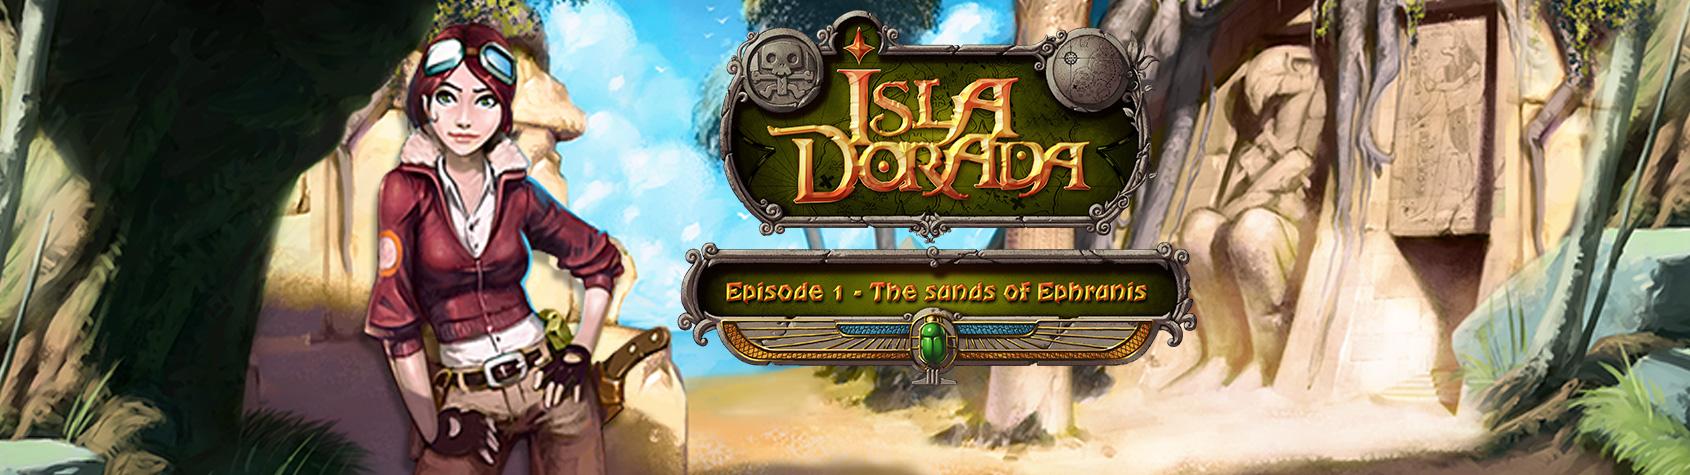 Isla Dorada - Episode 1: The Sands of Ephranis